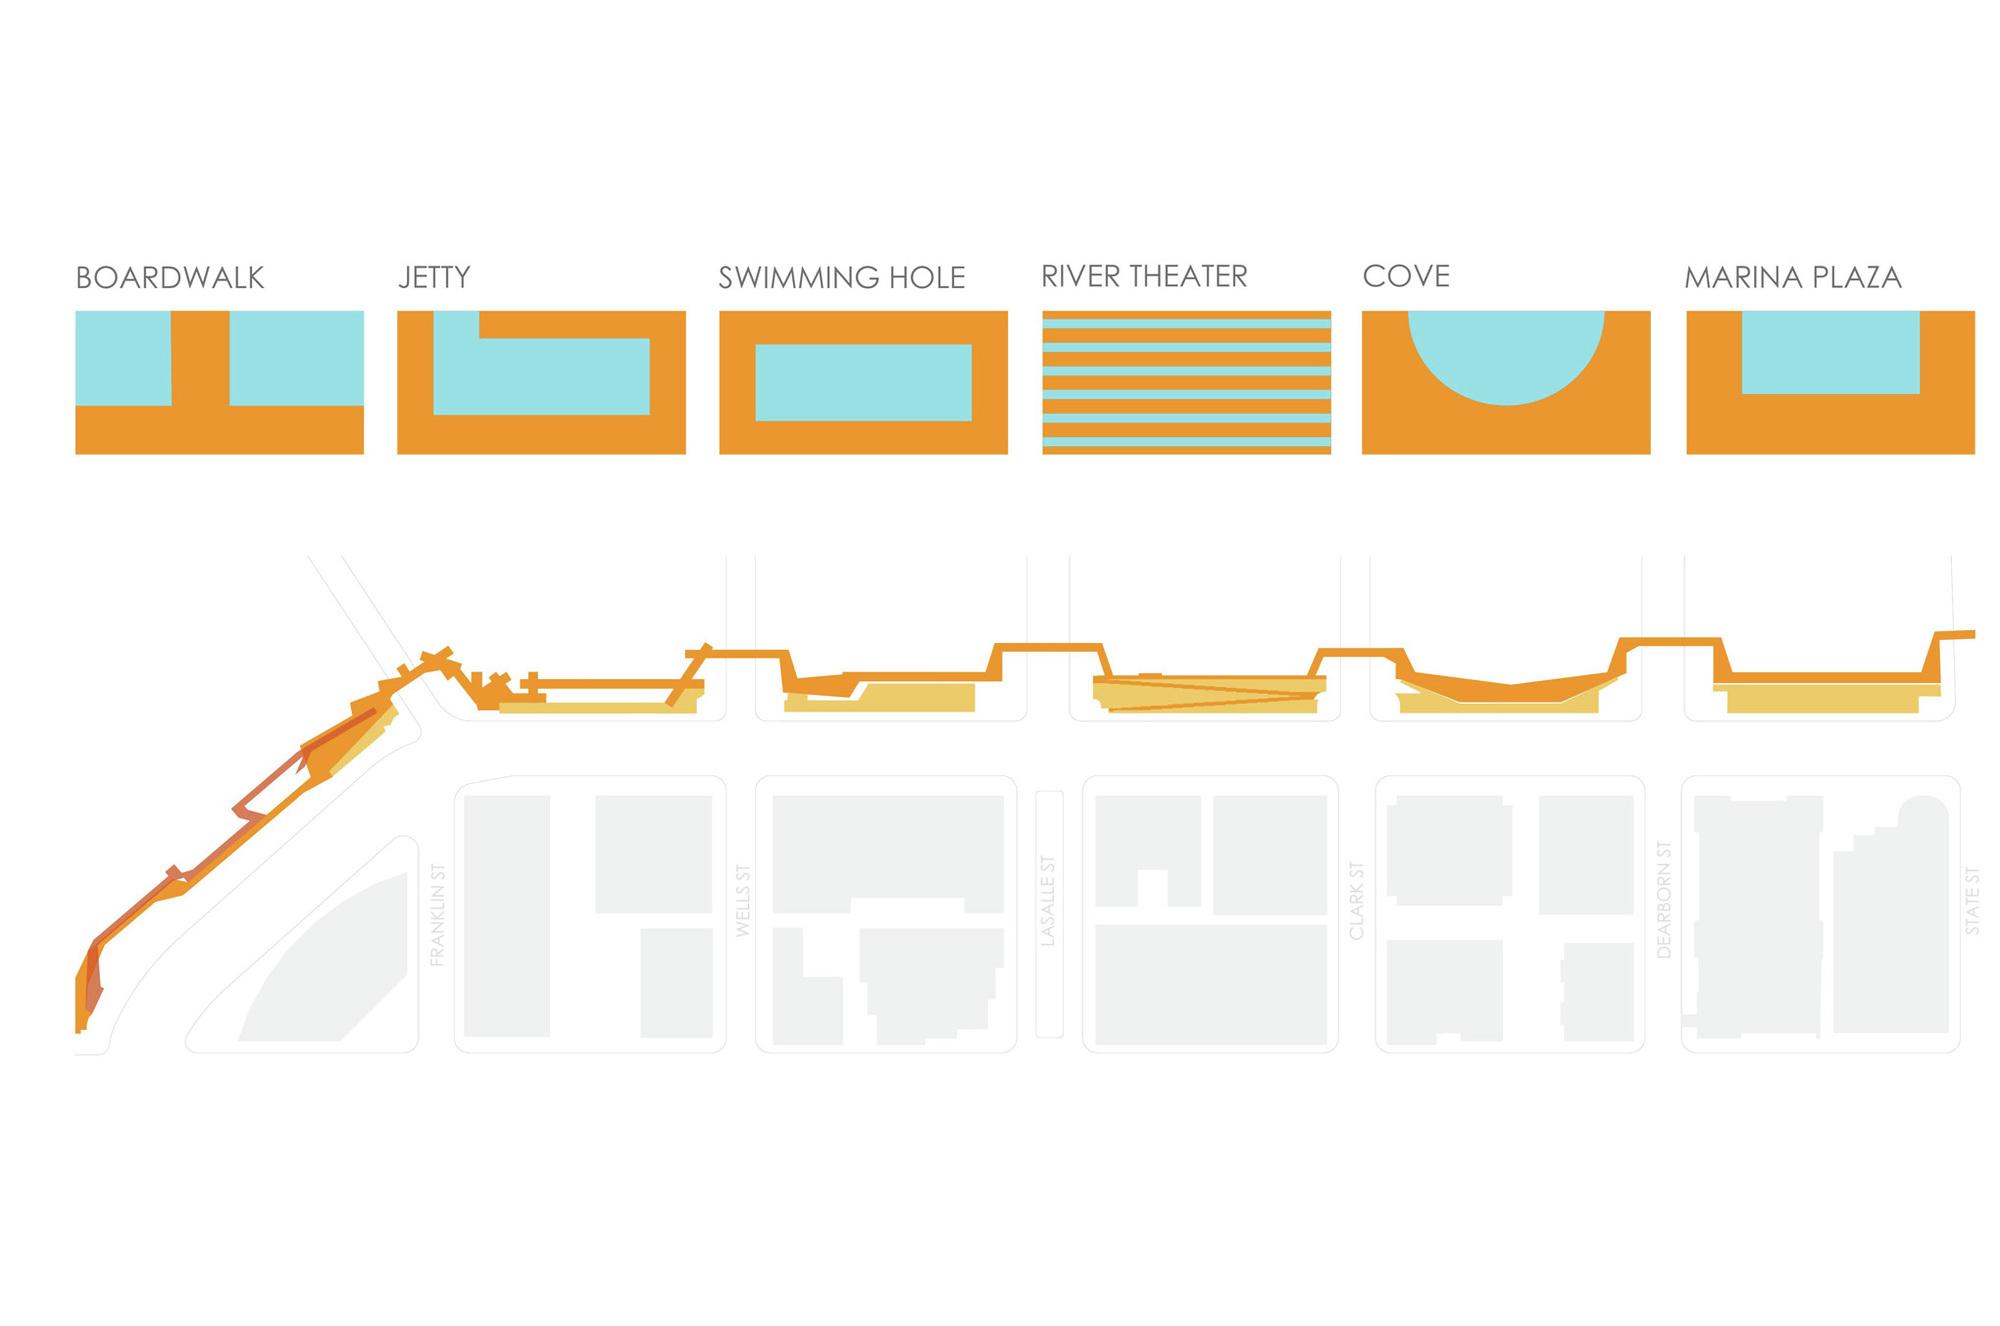 raid 5 concept with diagram 98 ford f150 trailer wiring gallery of chicago riverwalk proposal sasaki associates